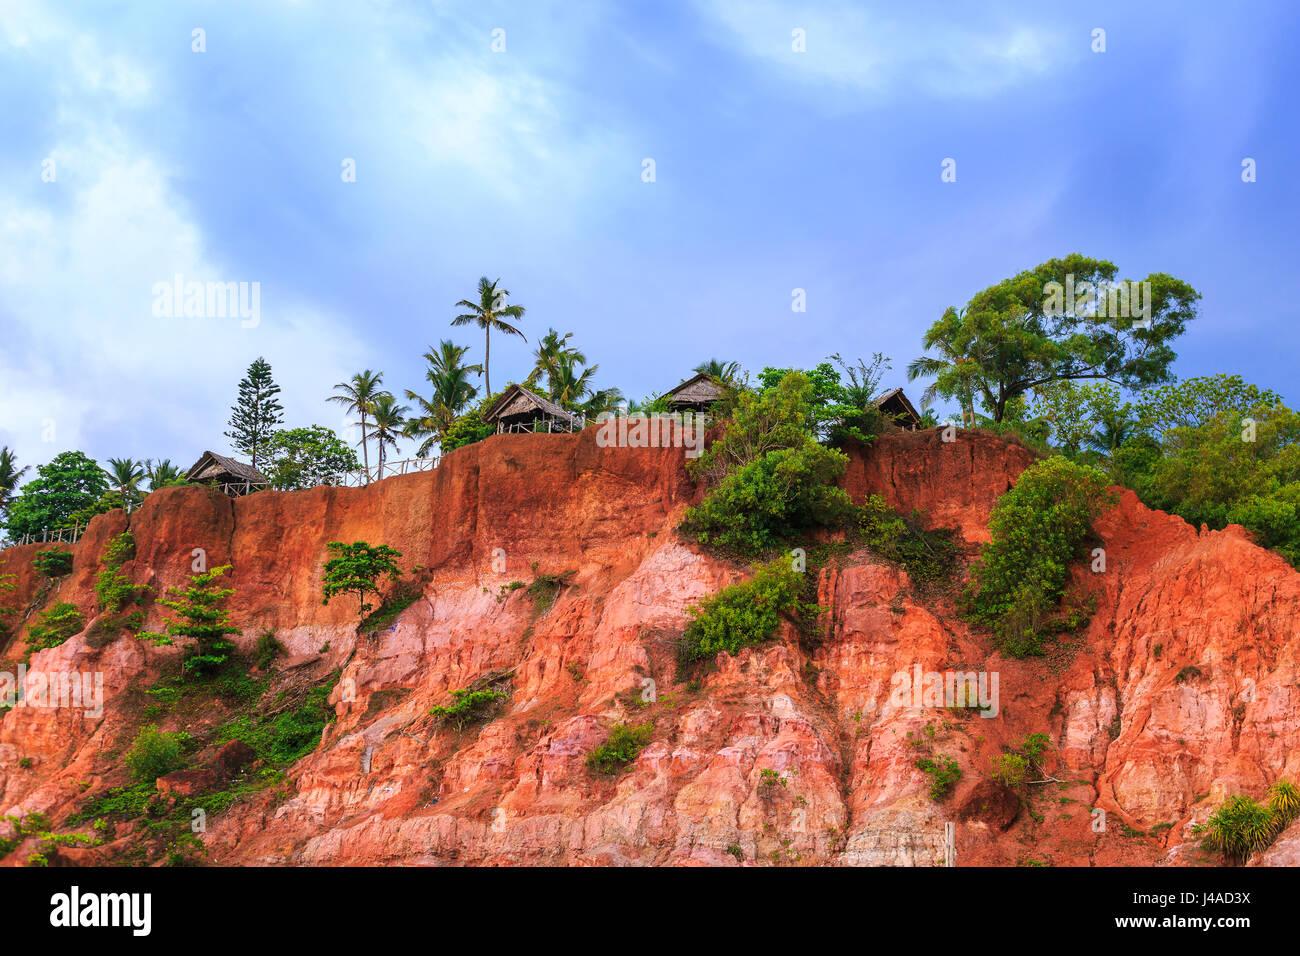 Fishing huts on the cliff. Varkala, Kerala state, South India. Stock Photo